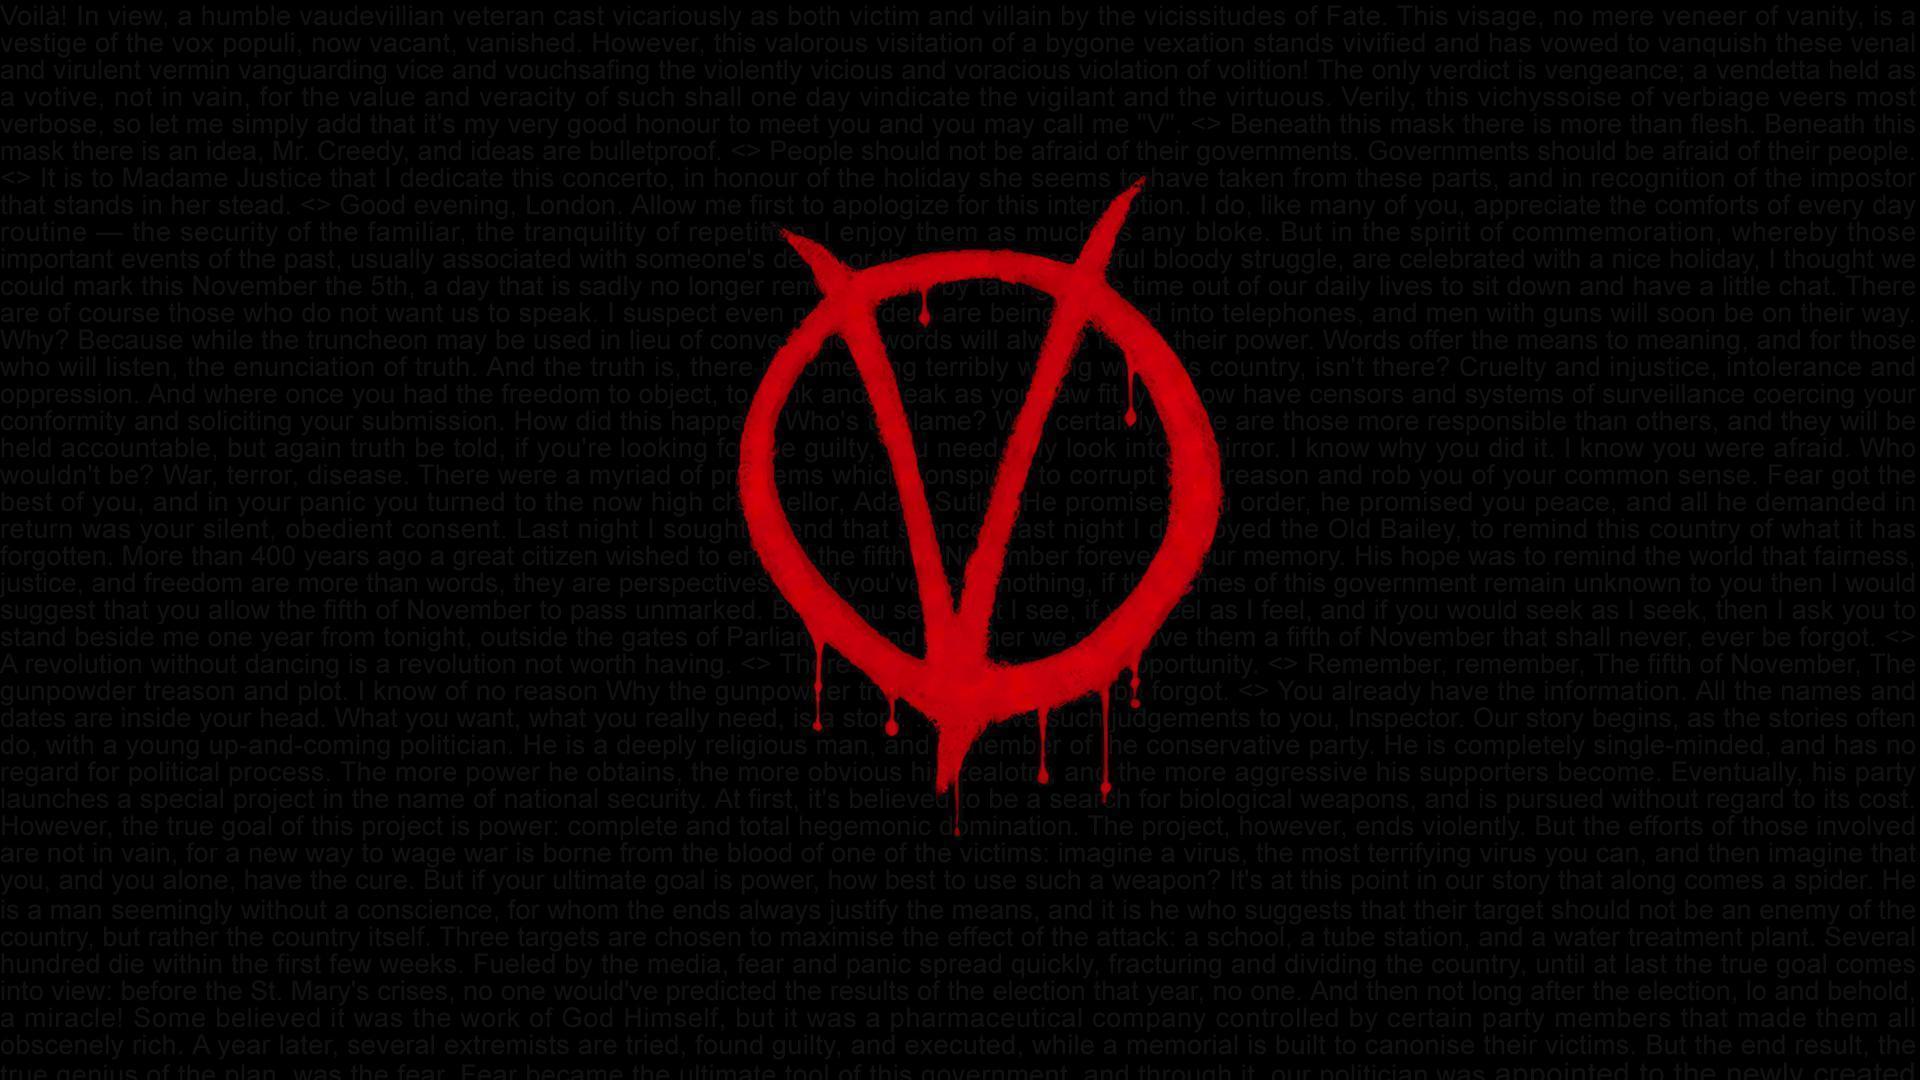 V For Vendetta Wallpaper Hd